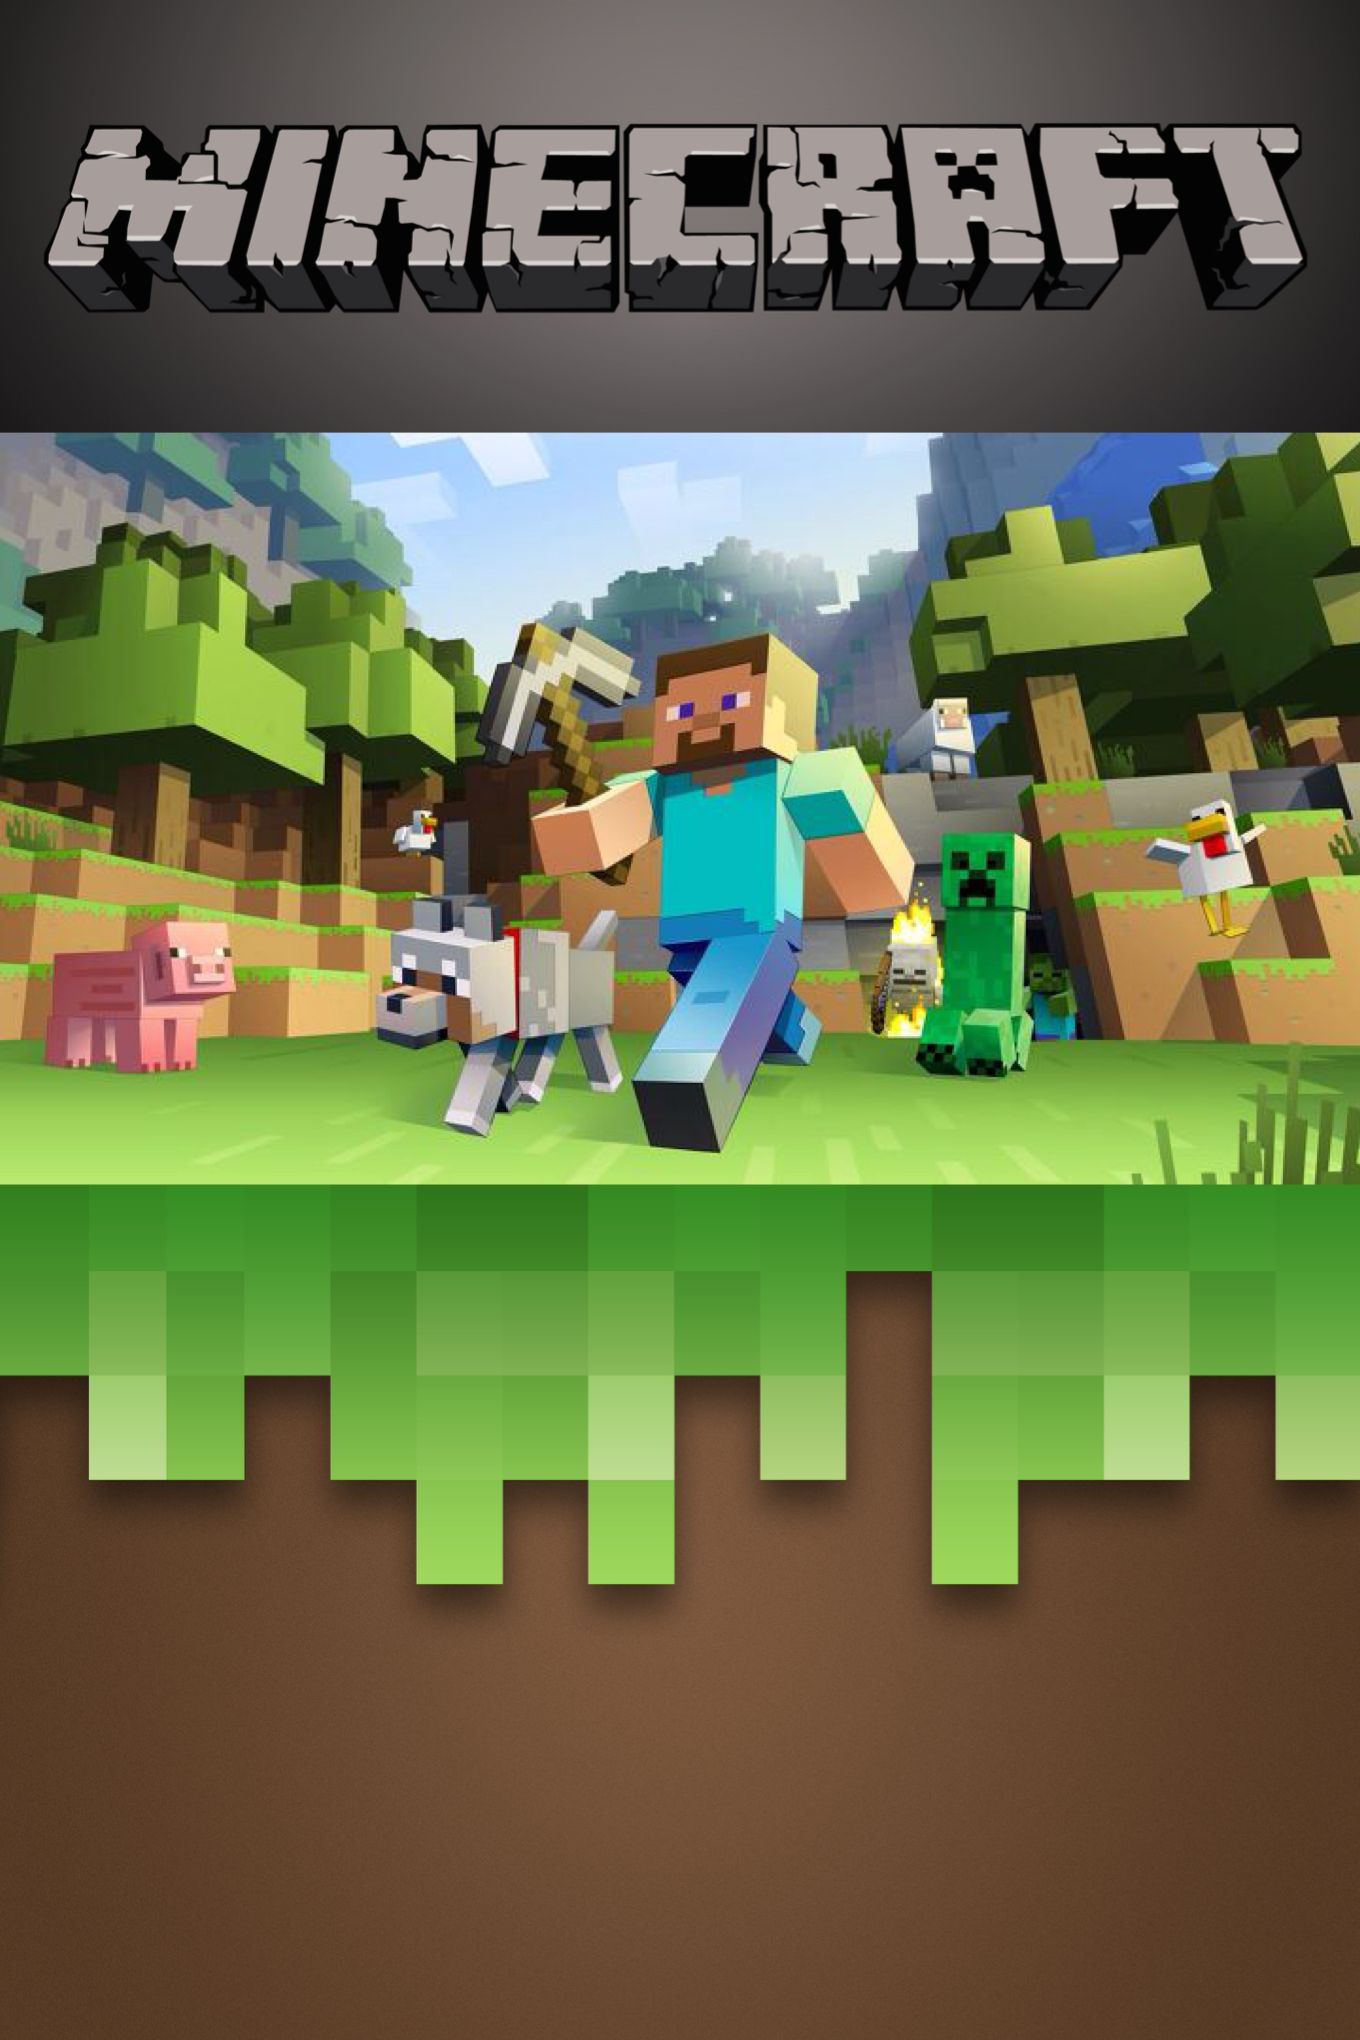 Free Minecraft Invitation Template. Edit On Phonto App, Print As 4X6 - Free Printable Minecraft Birthday Party Invitations Templates